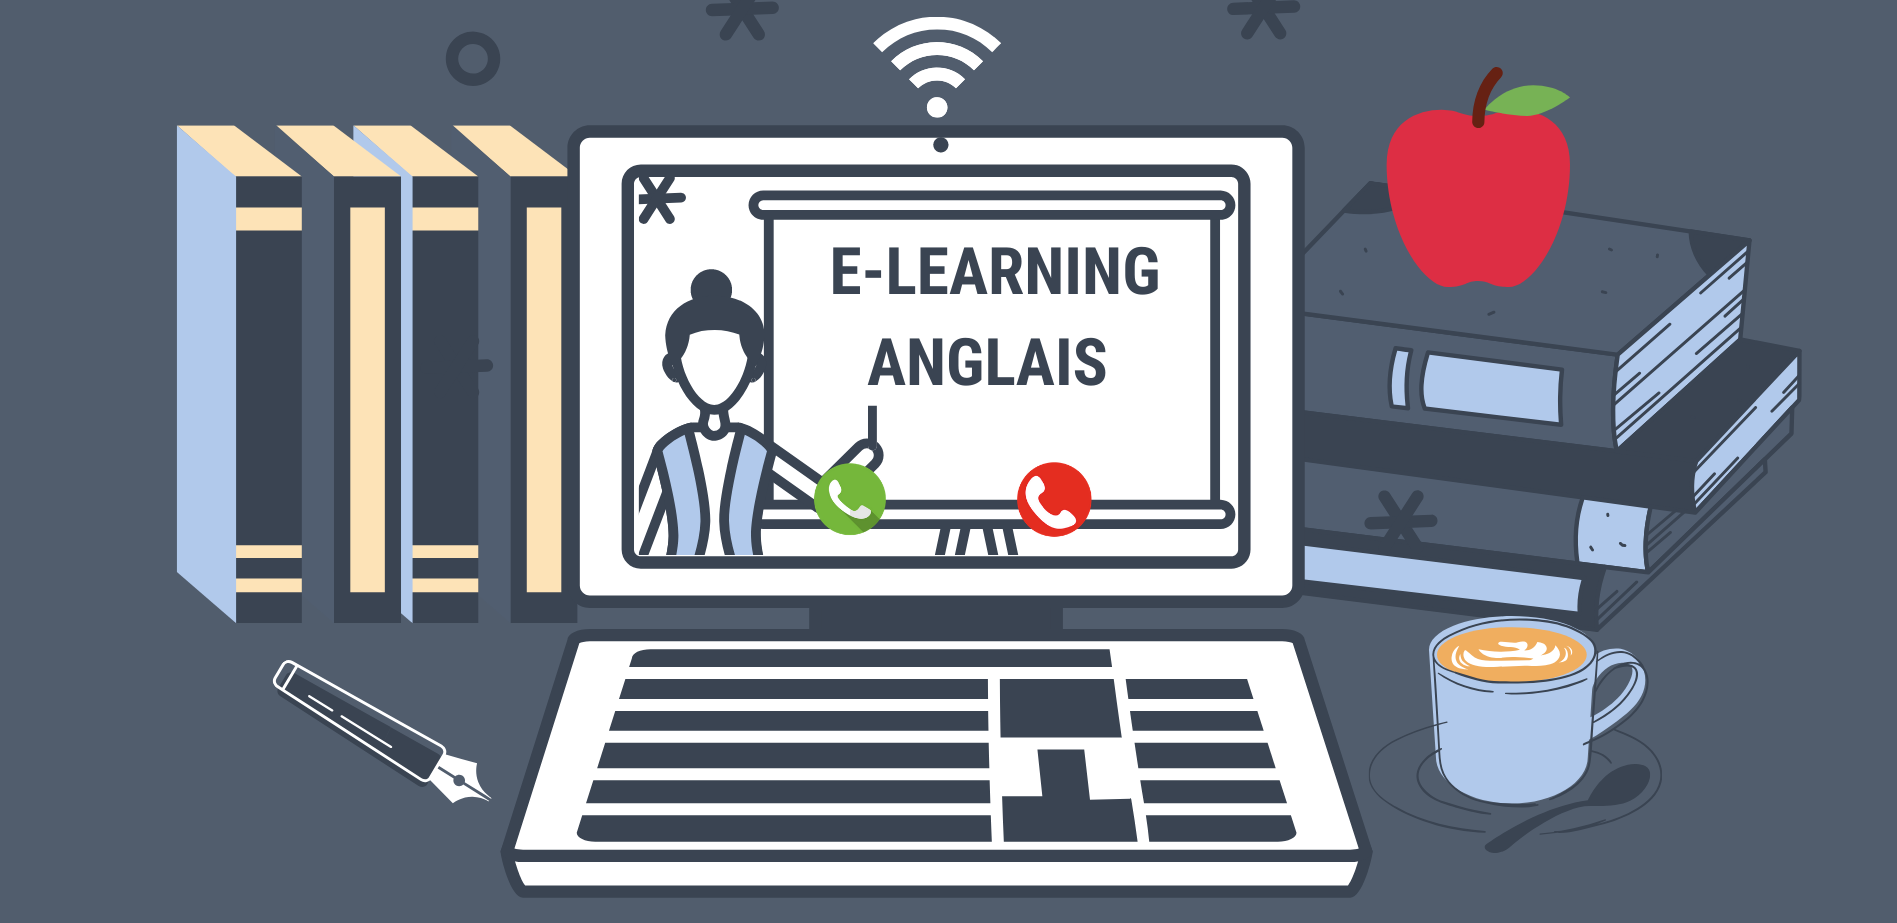 e-learning anglais